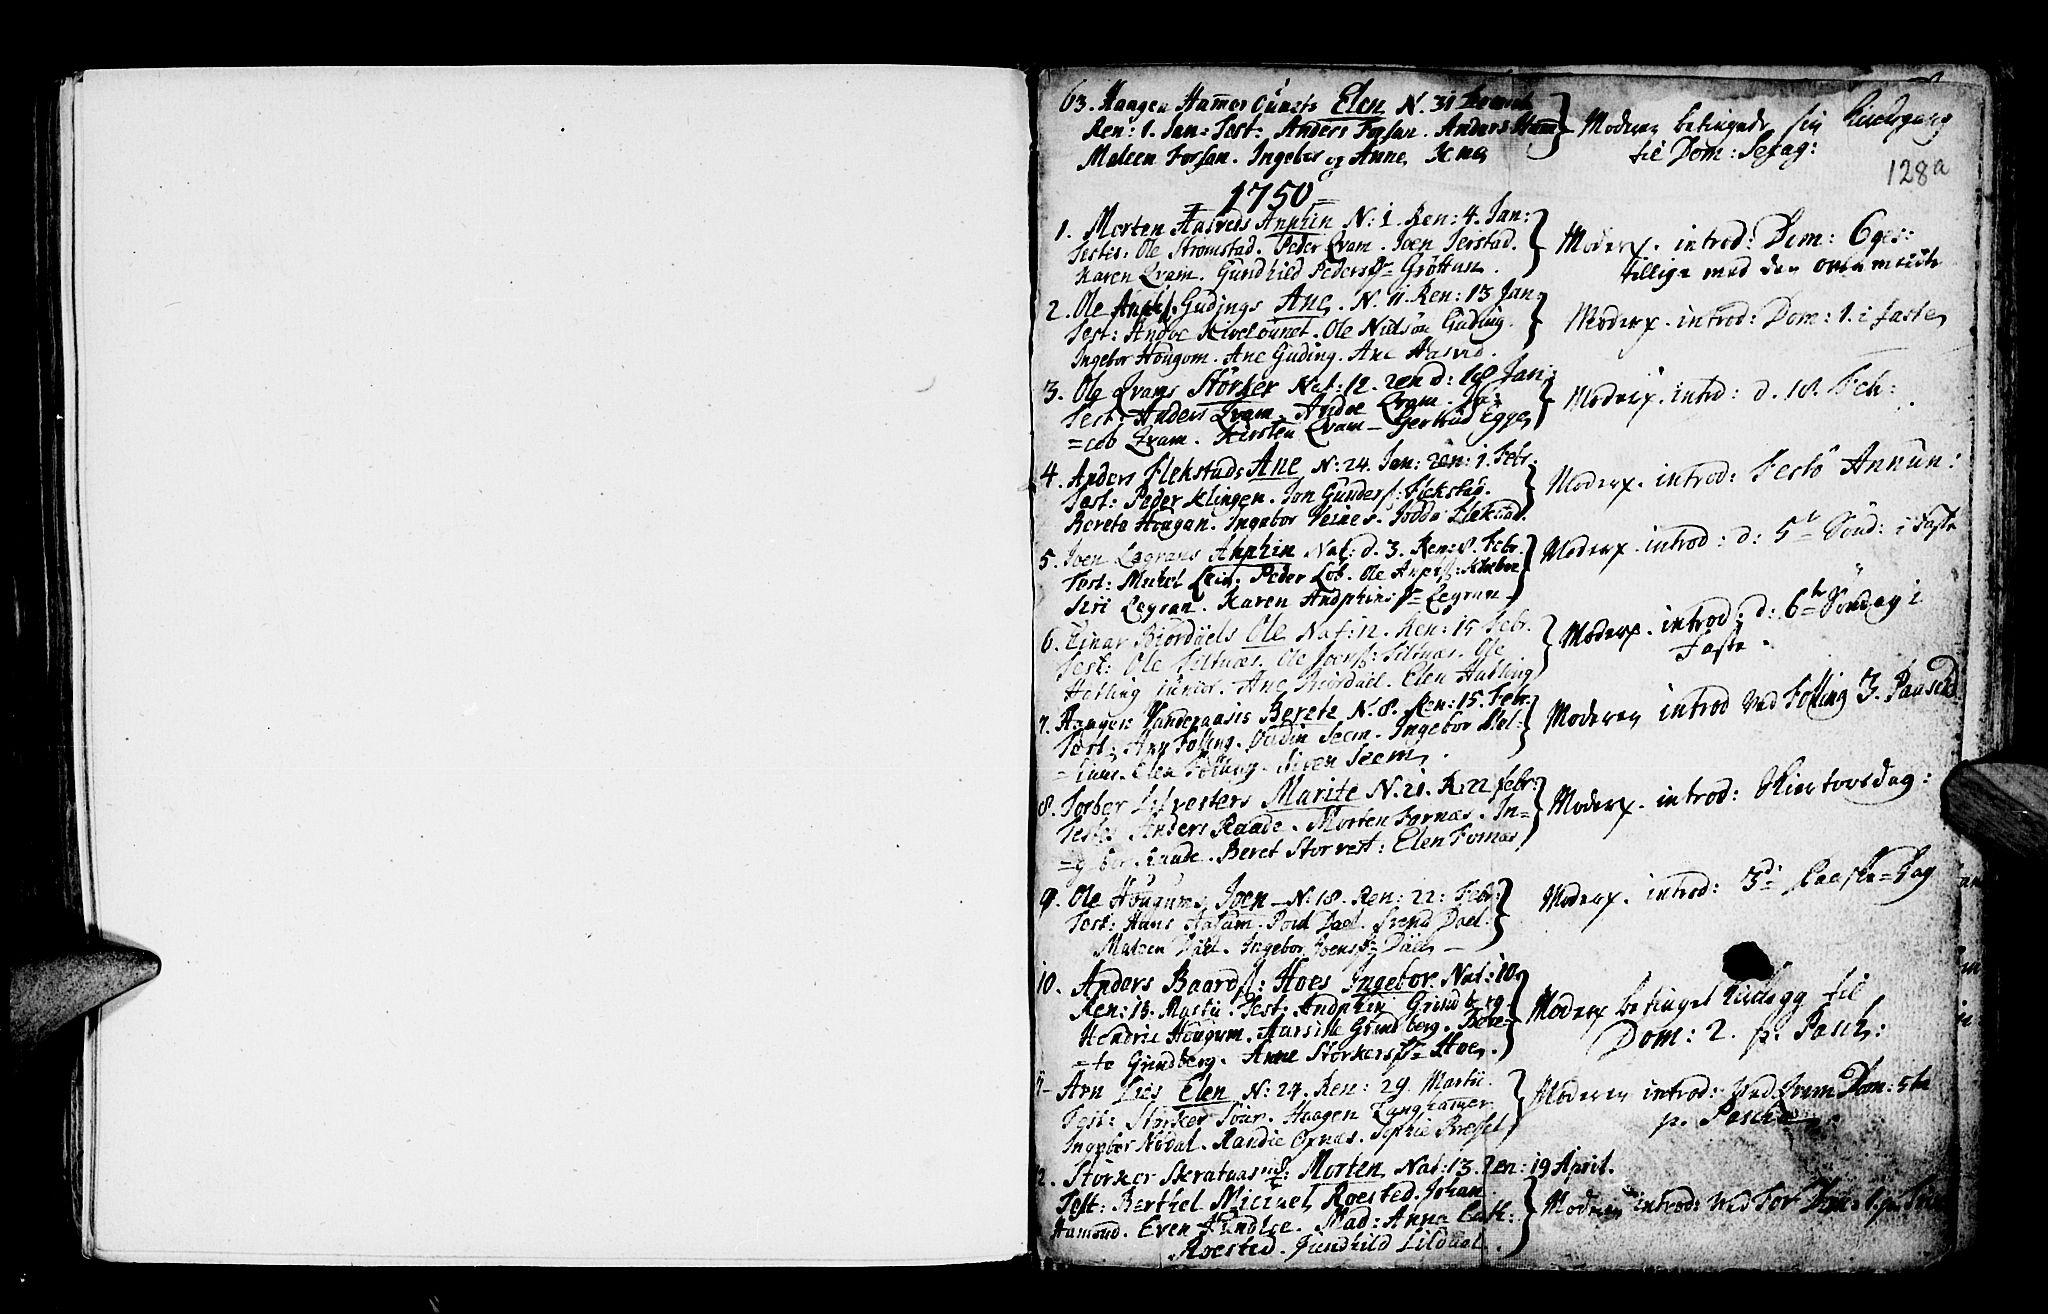 SAT, Ministerialprotokoller, klokkerbøker og fødselsregistre - Nord-Trøndelag, 746/L0439: Ministerialbok nr. 746A01, 1688-1759, s. 128a